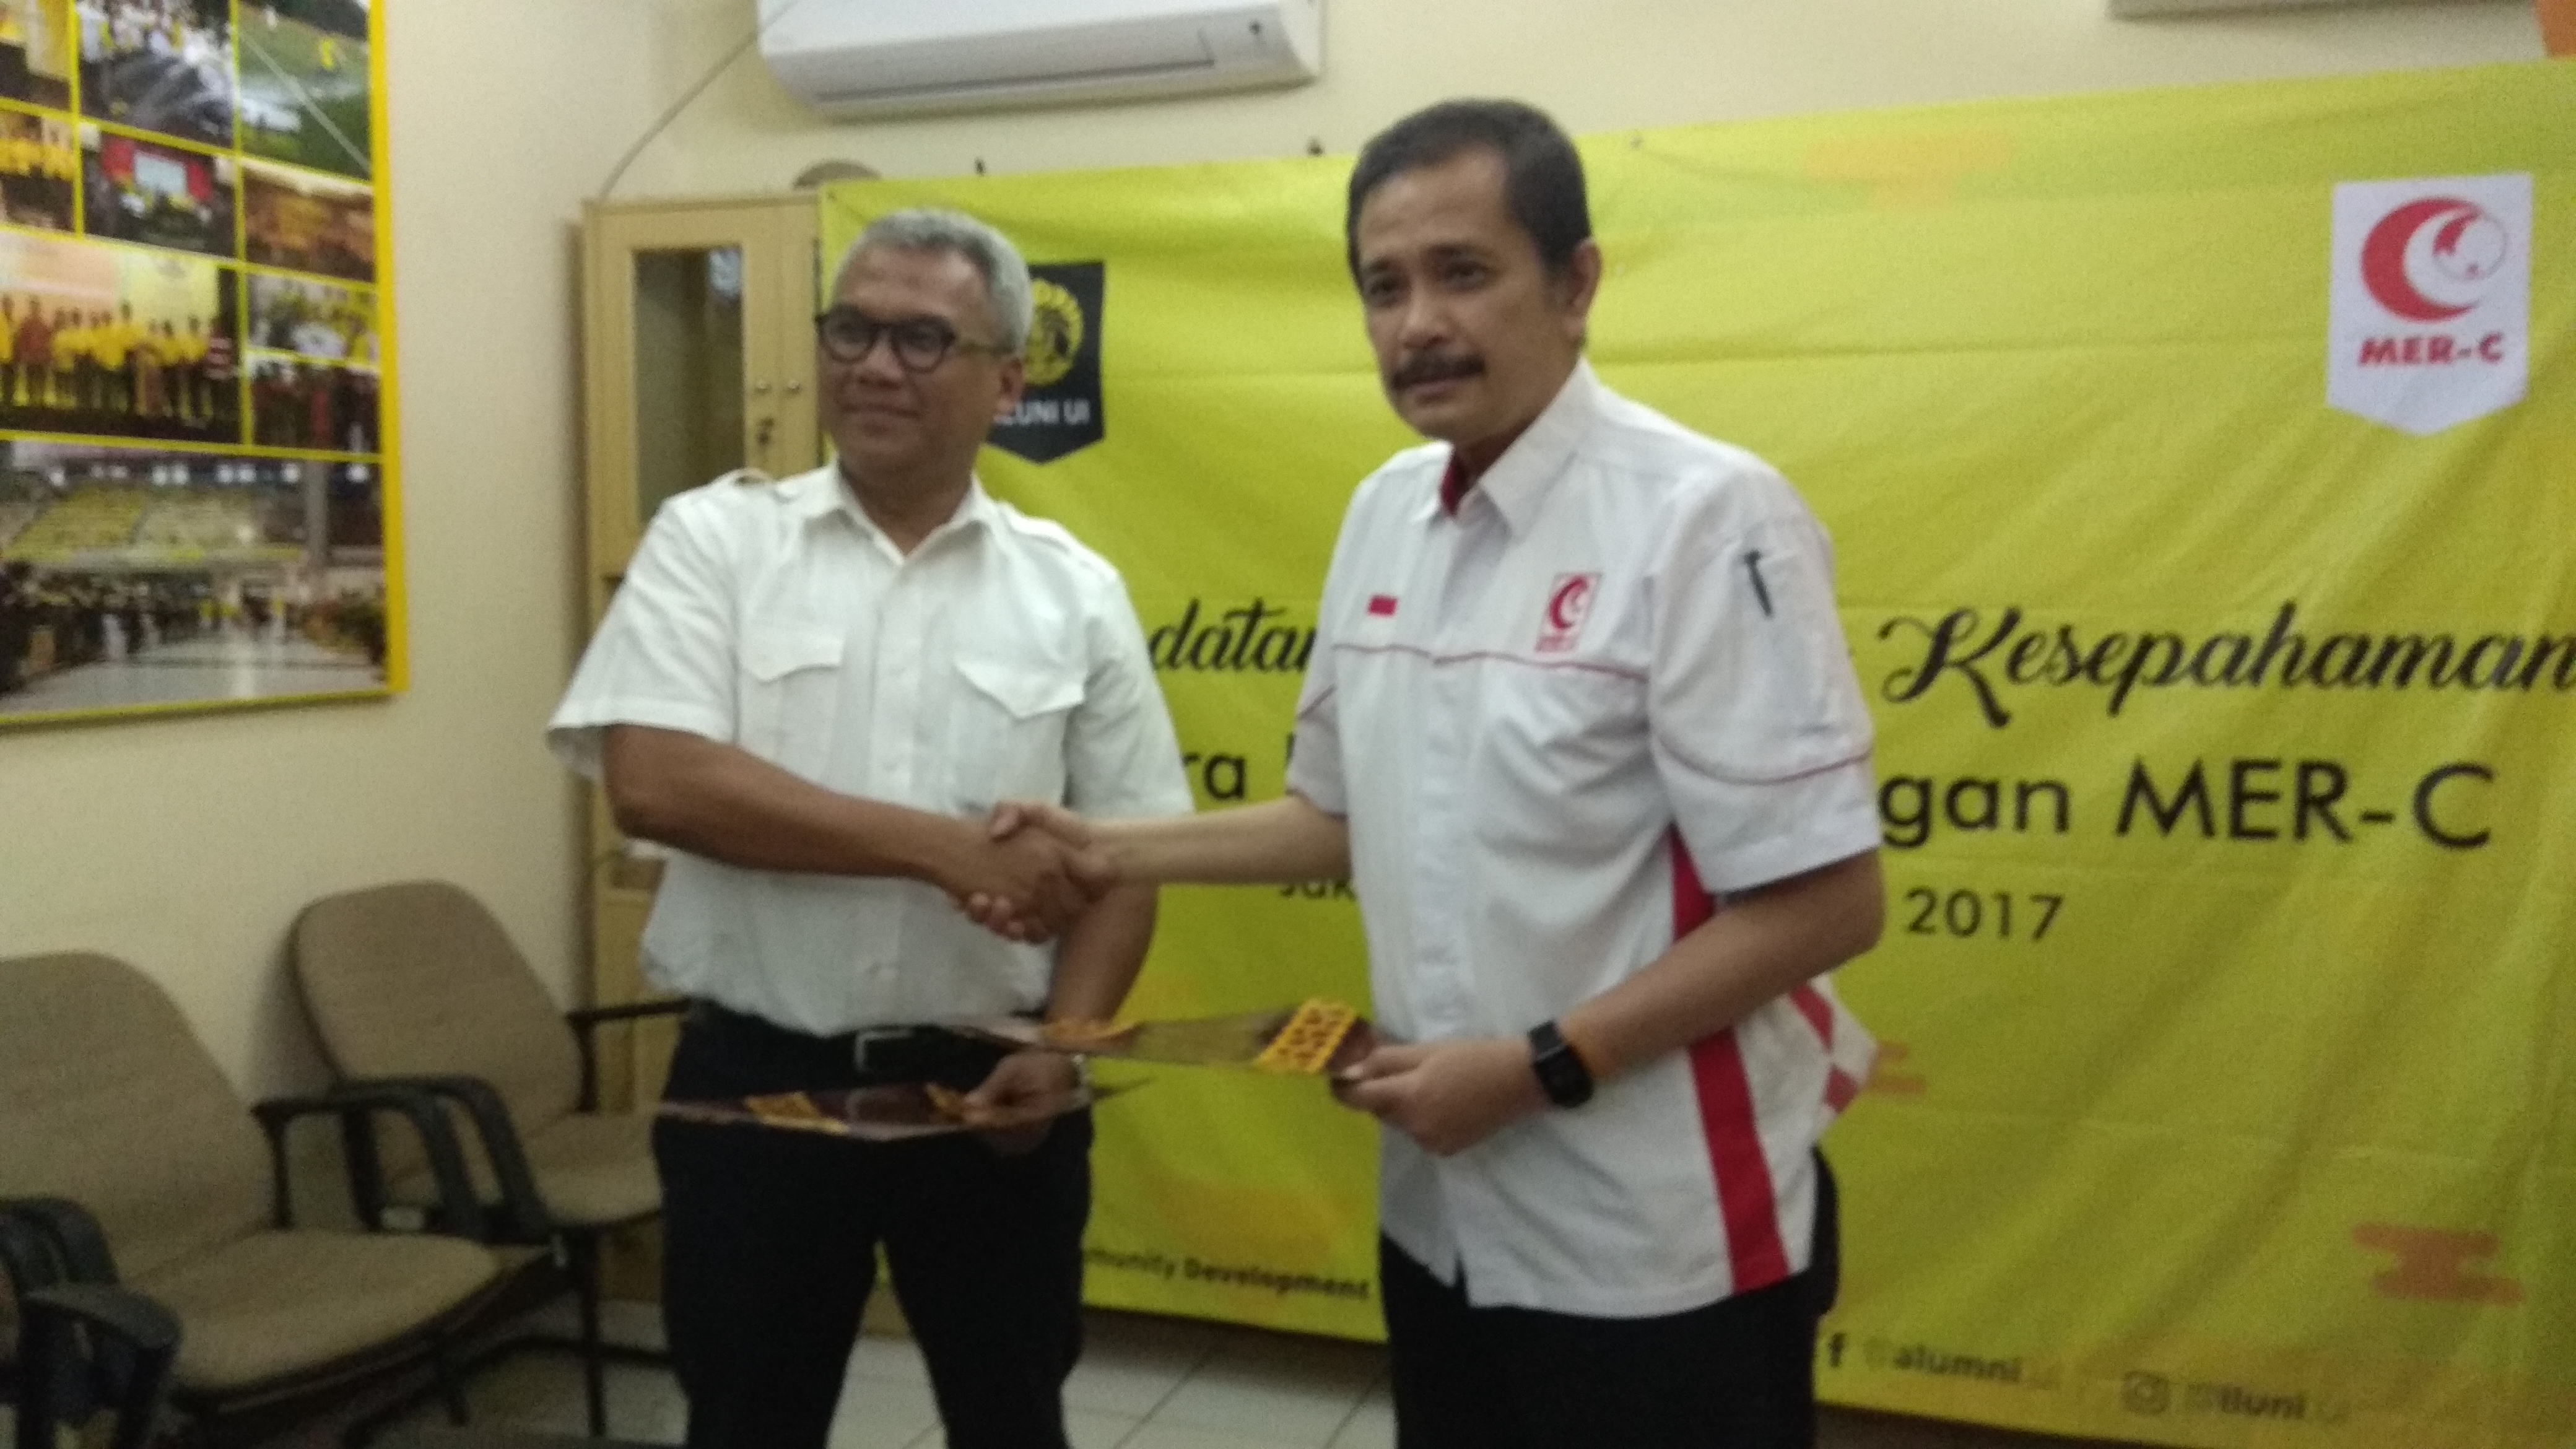 Alumni UI dan MER-C Jalin Kerjasama Bantu Rohingya